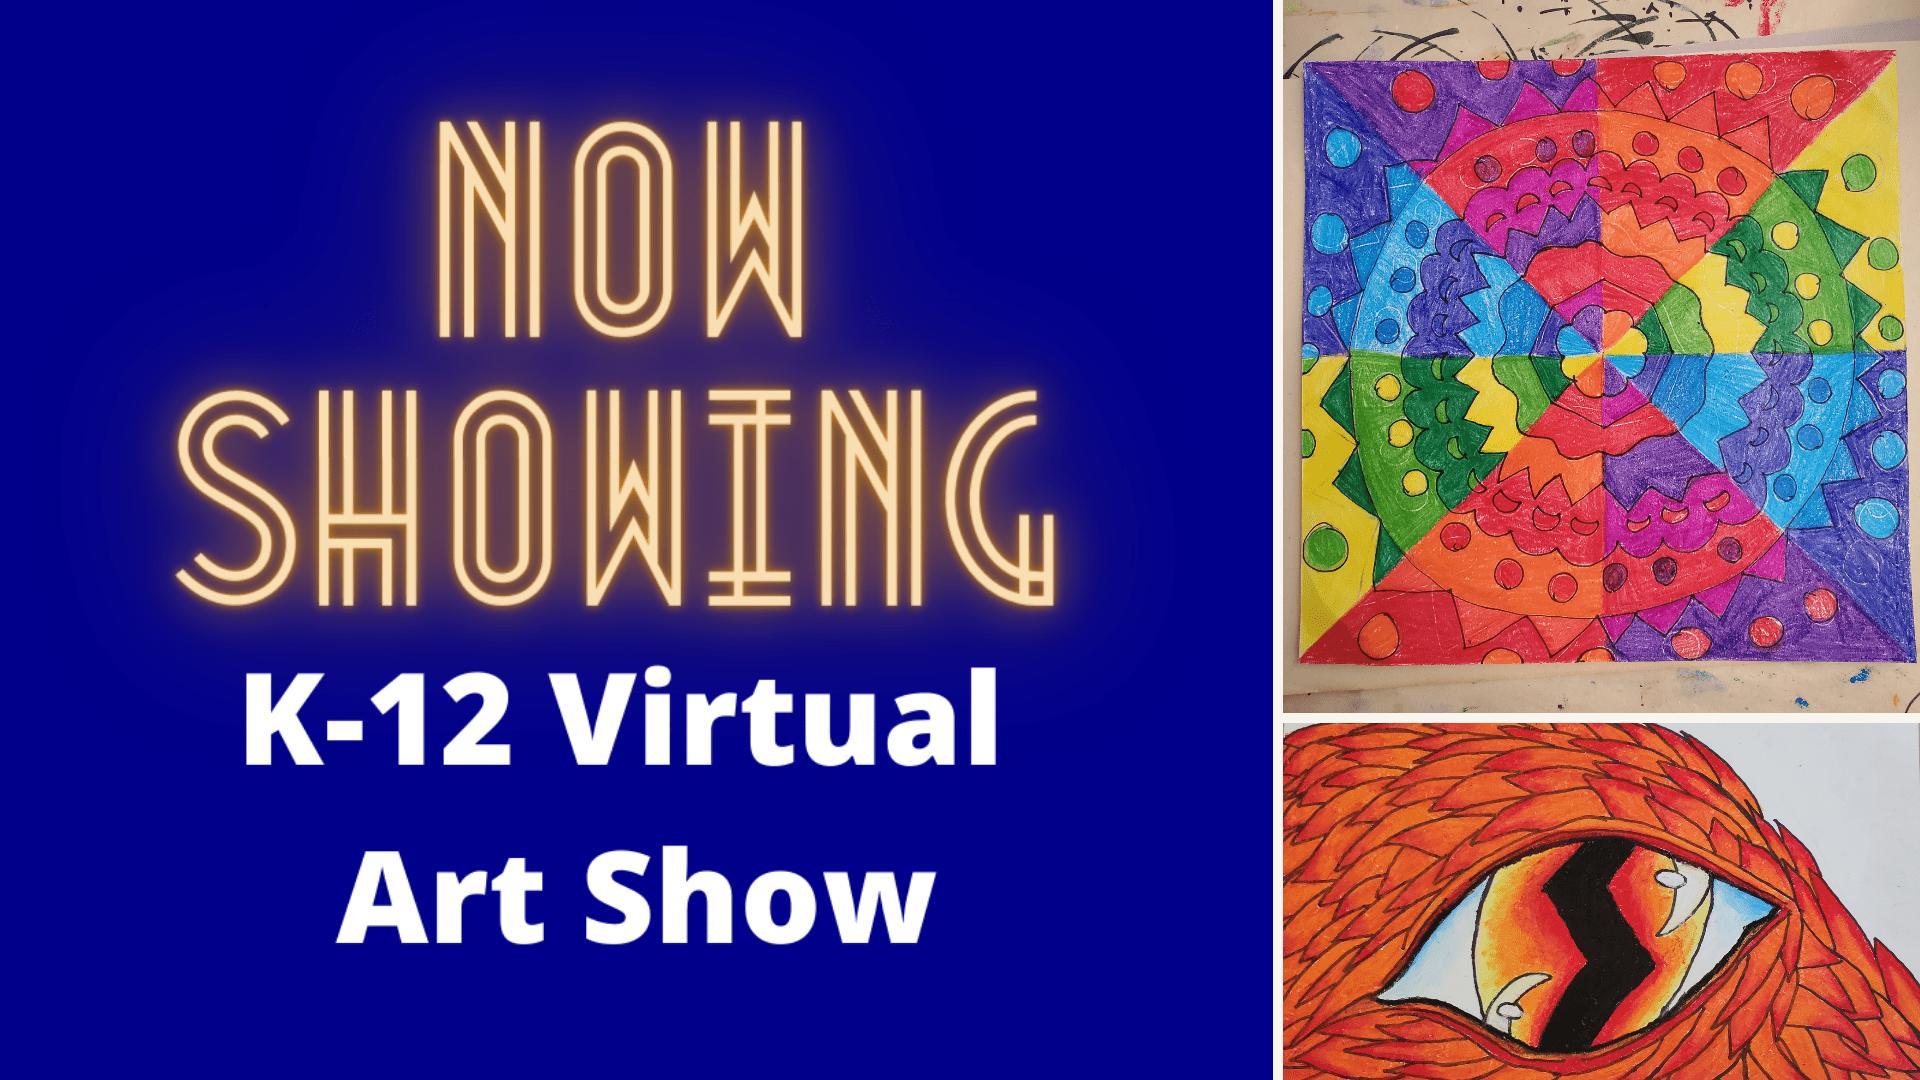 now showing k-12 virtual art show